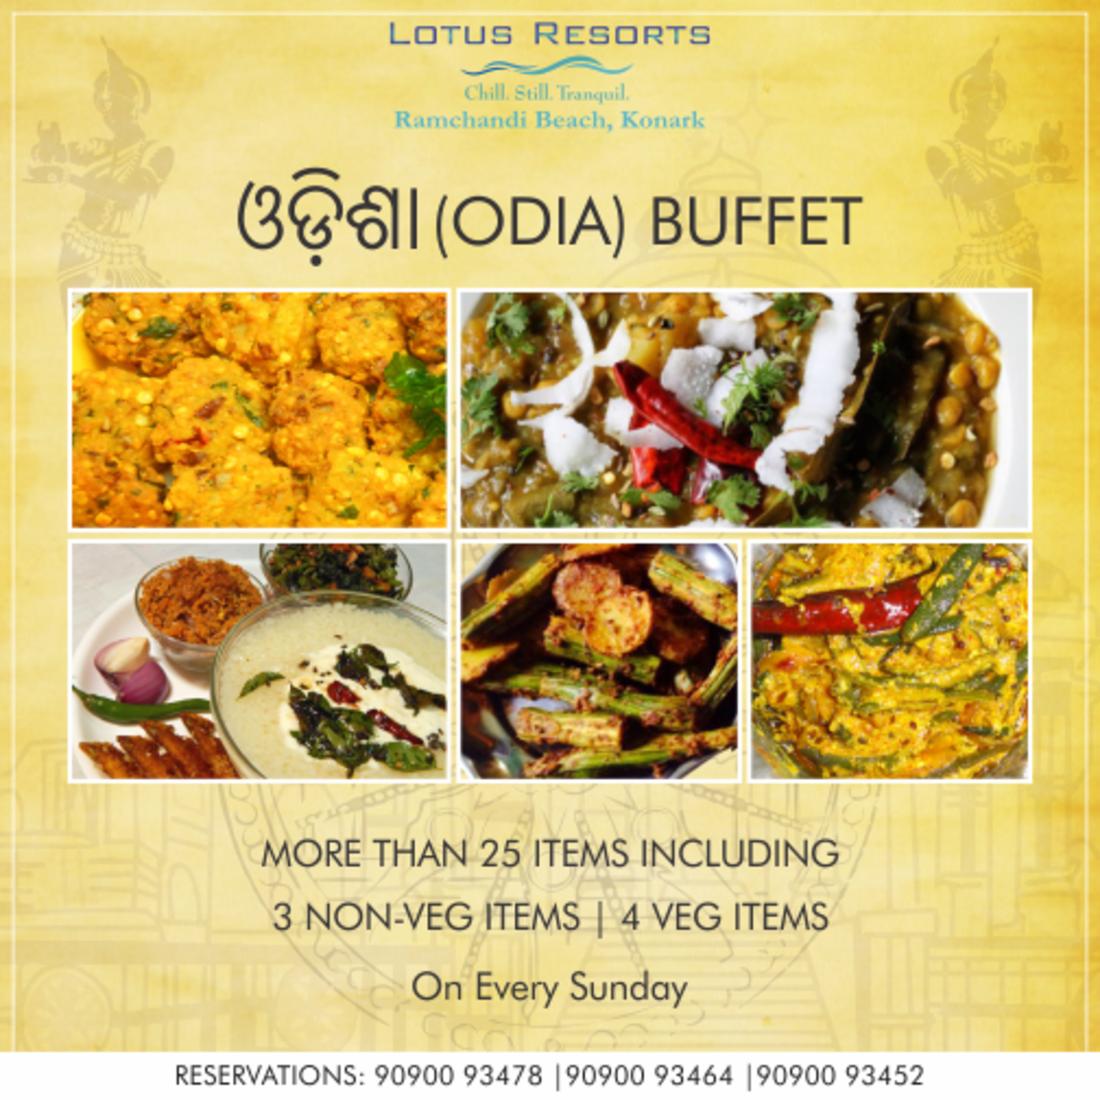 Lotus Eco Resort Konark Konark Odia Buffet